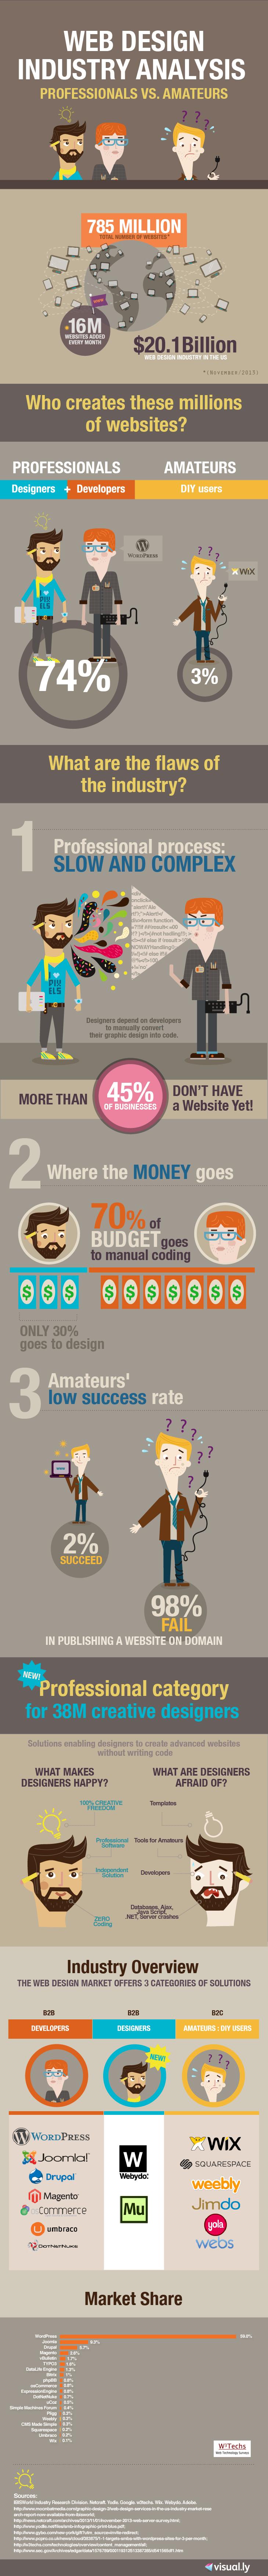 02 Webydo-Infographic